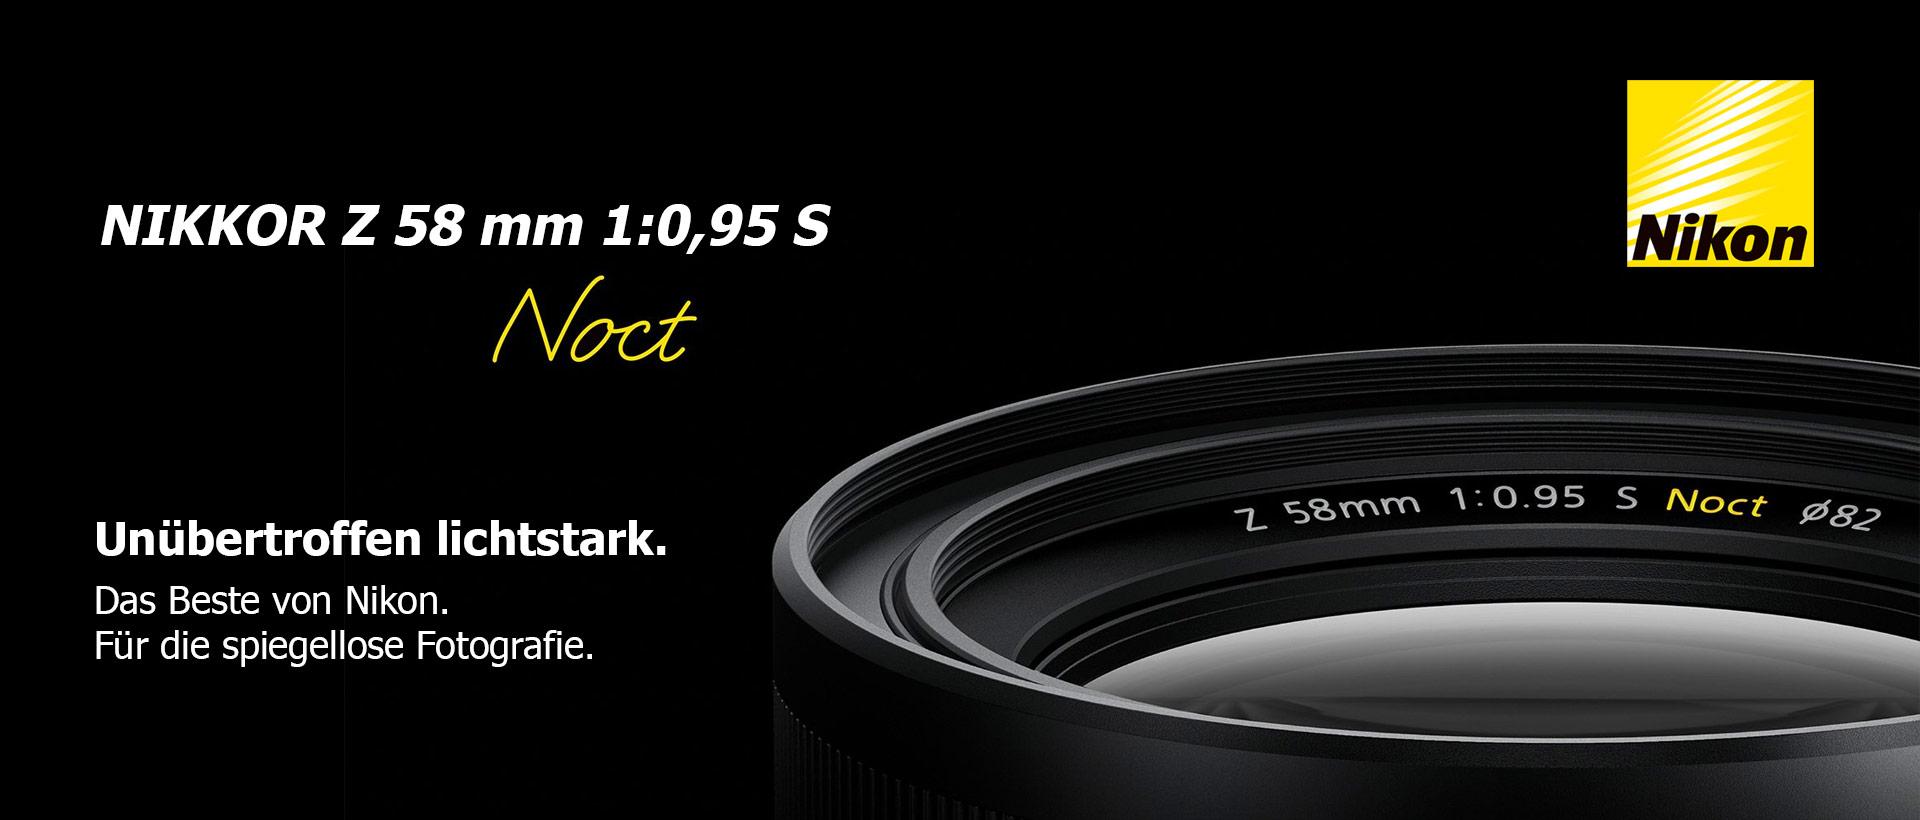 Nikon Z 0,95/58mm S Noct + 5-Jahre-Garantie-Aktion